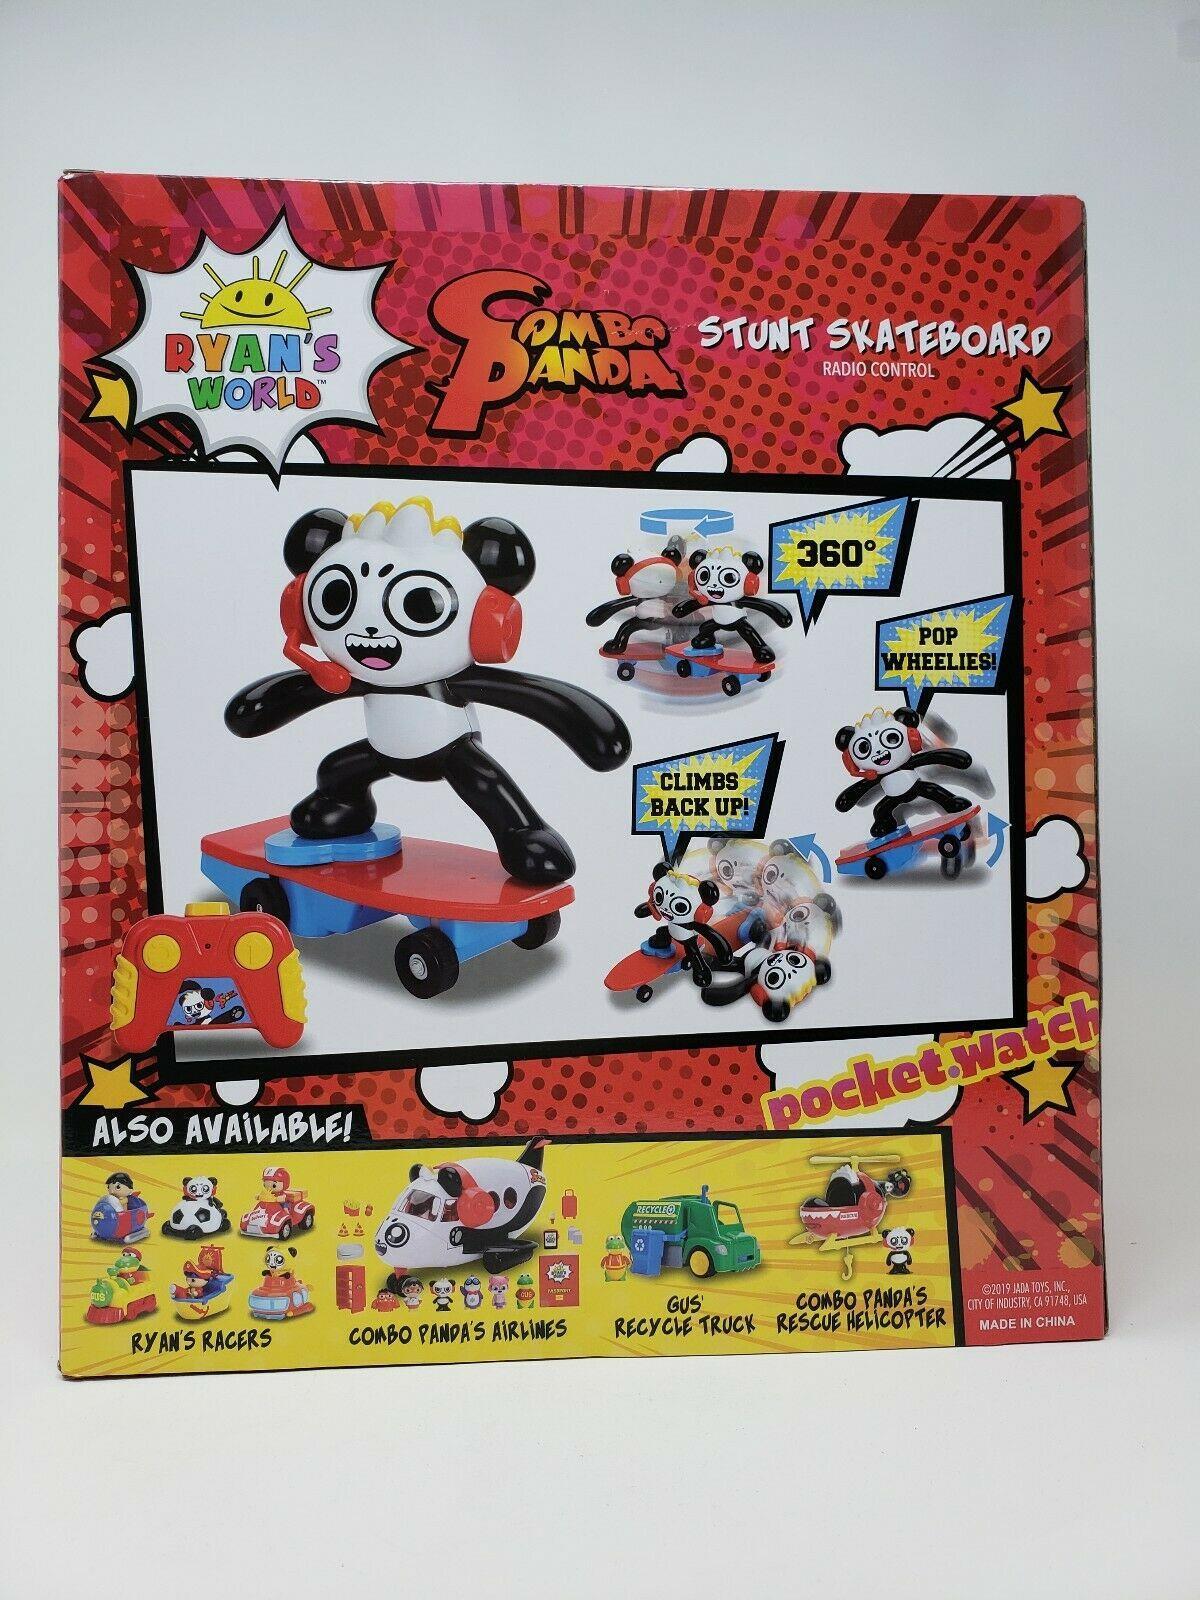 Ryan/'s World Combo Skate Board Radio Control Panda Stunt Toy NEW